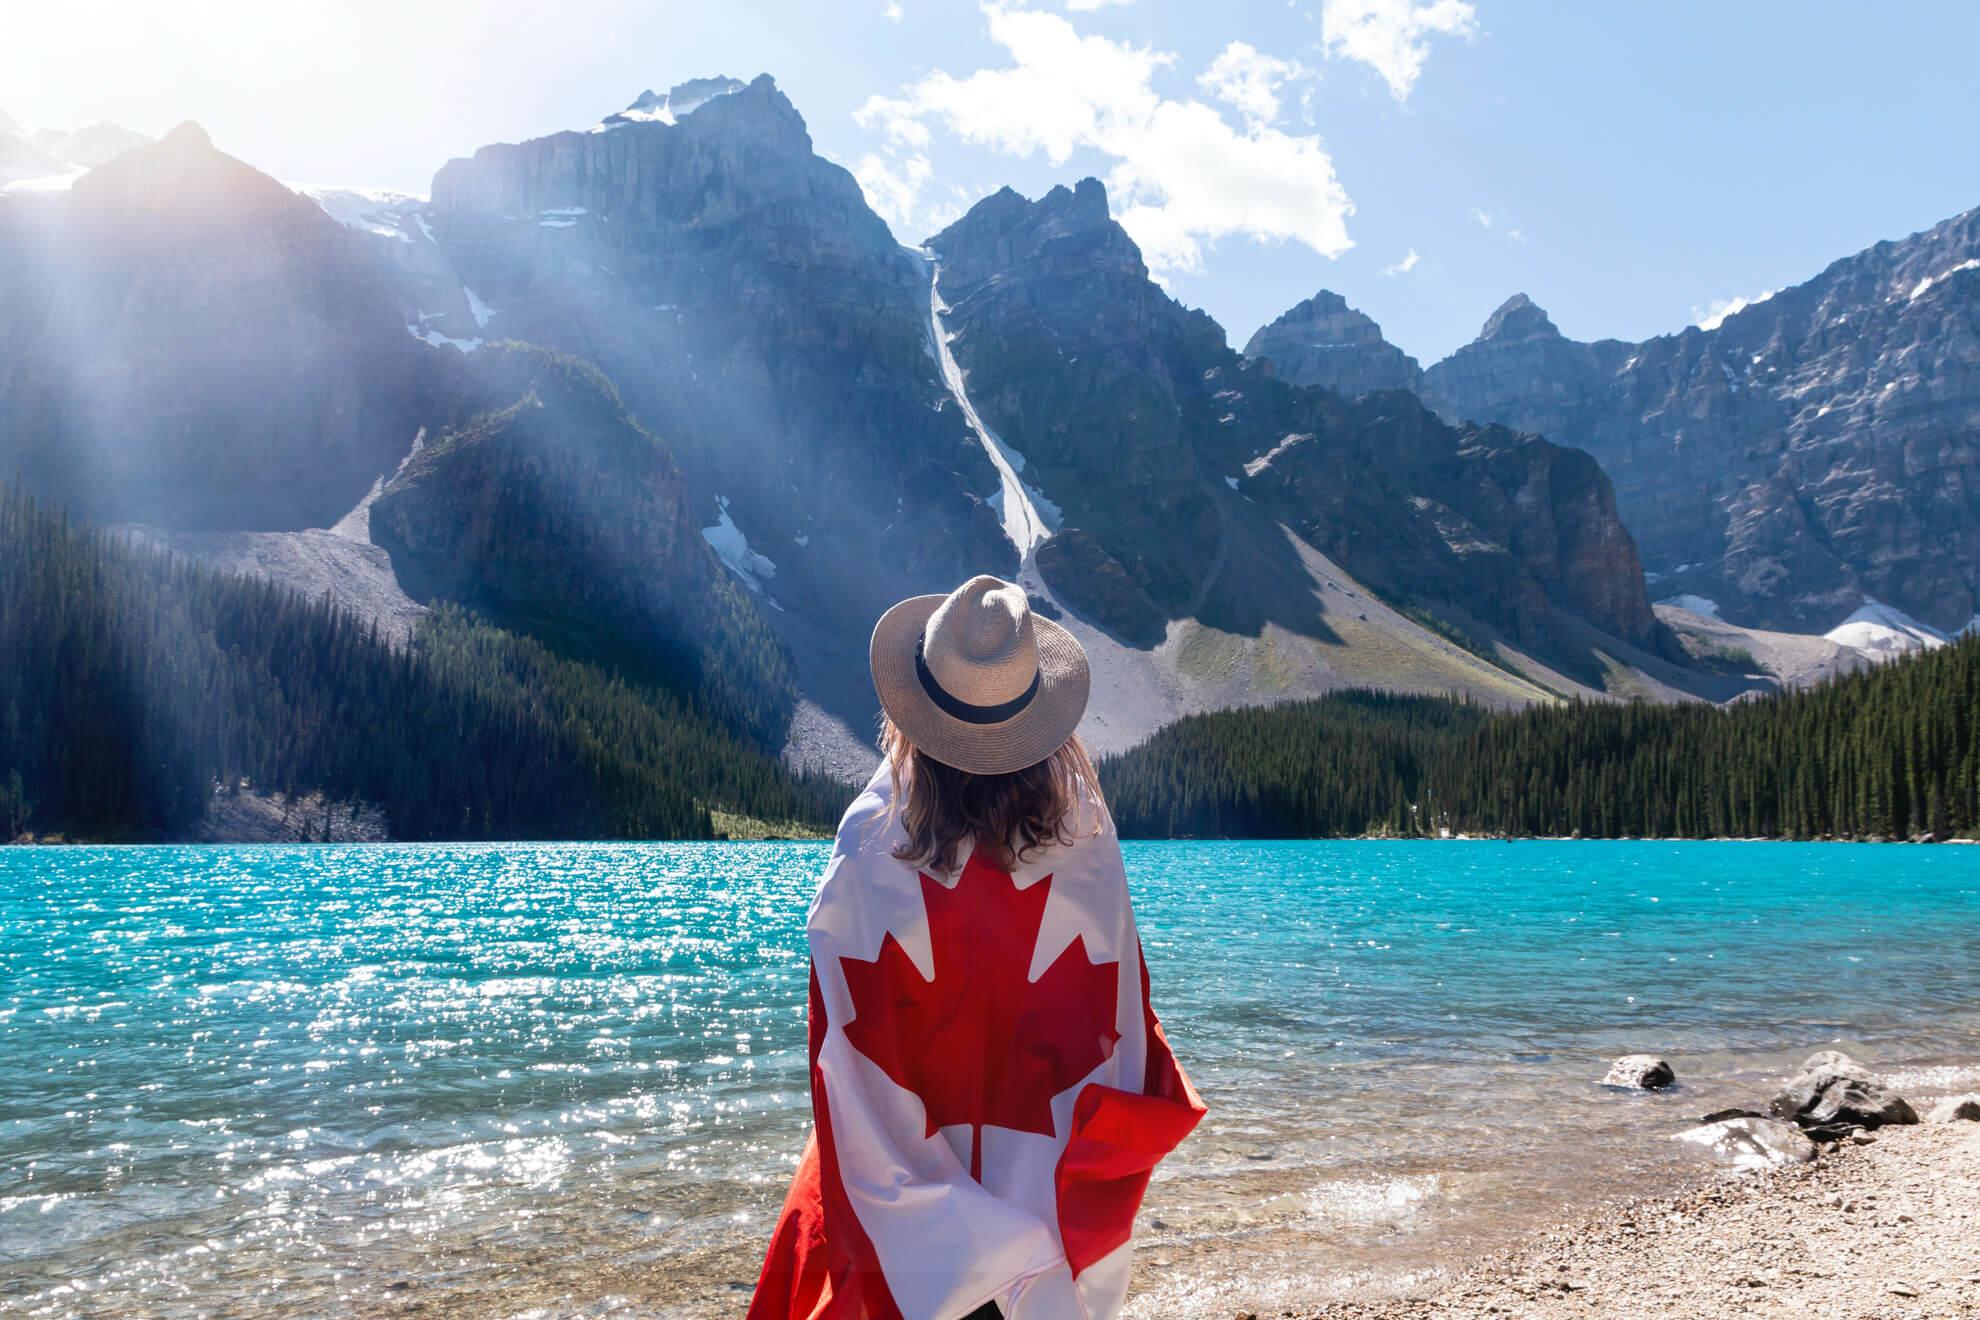 Cambridge Immigration, Visitor Visa, Vancouver, Canada, Tourist